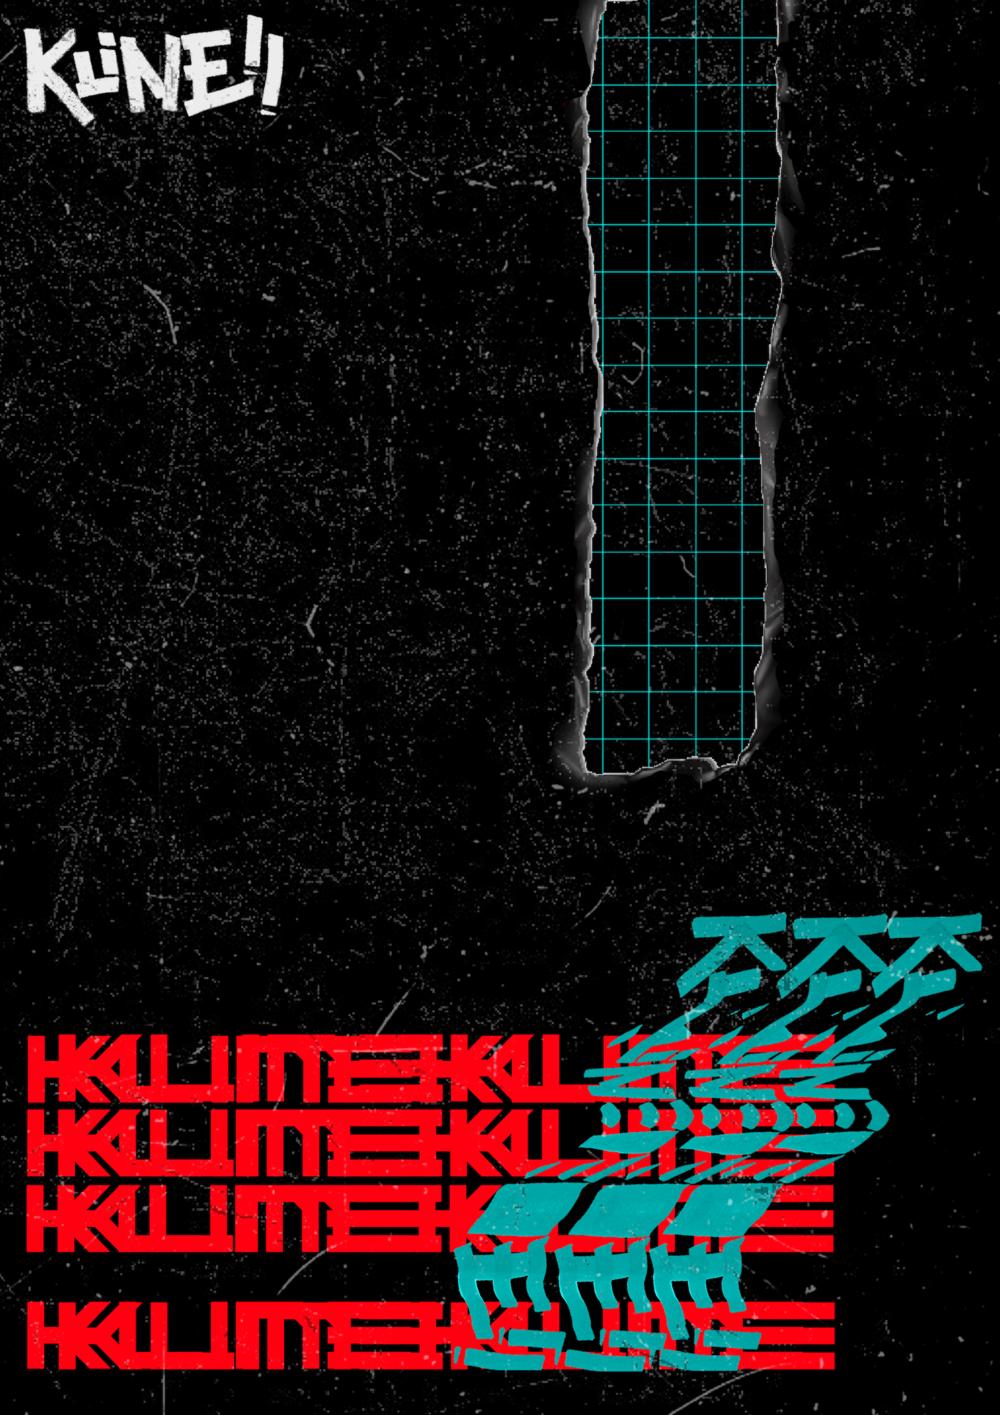 KLINEKLINE.png